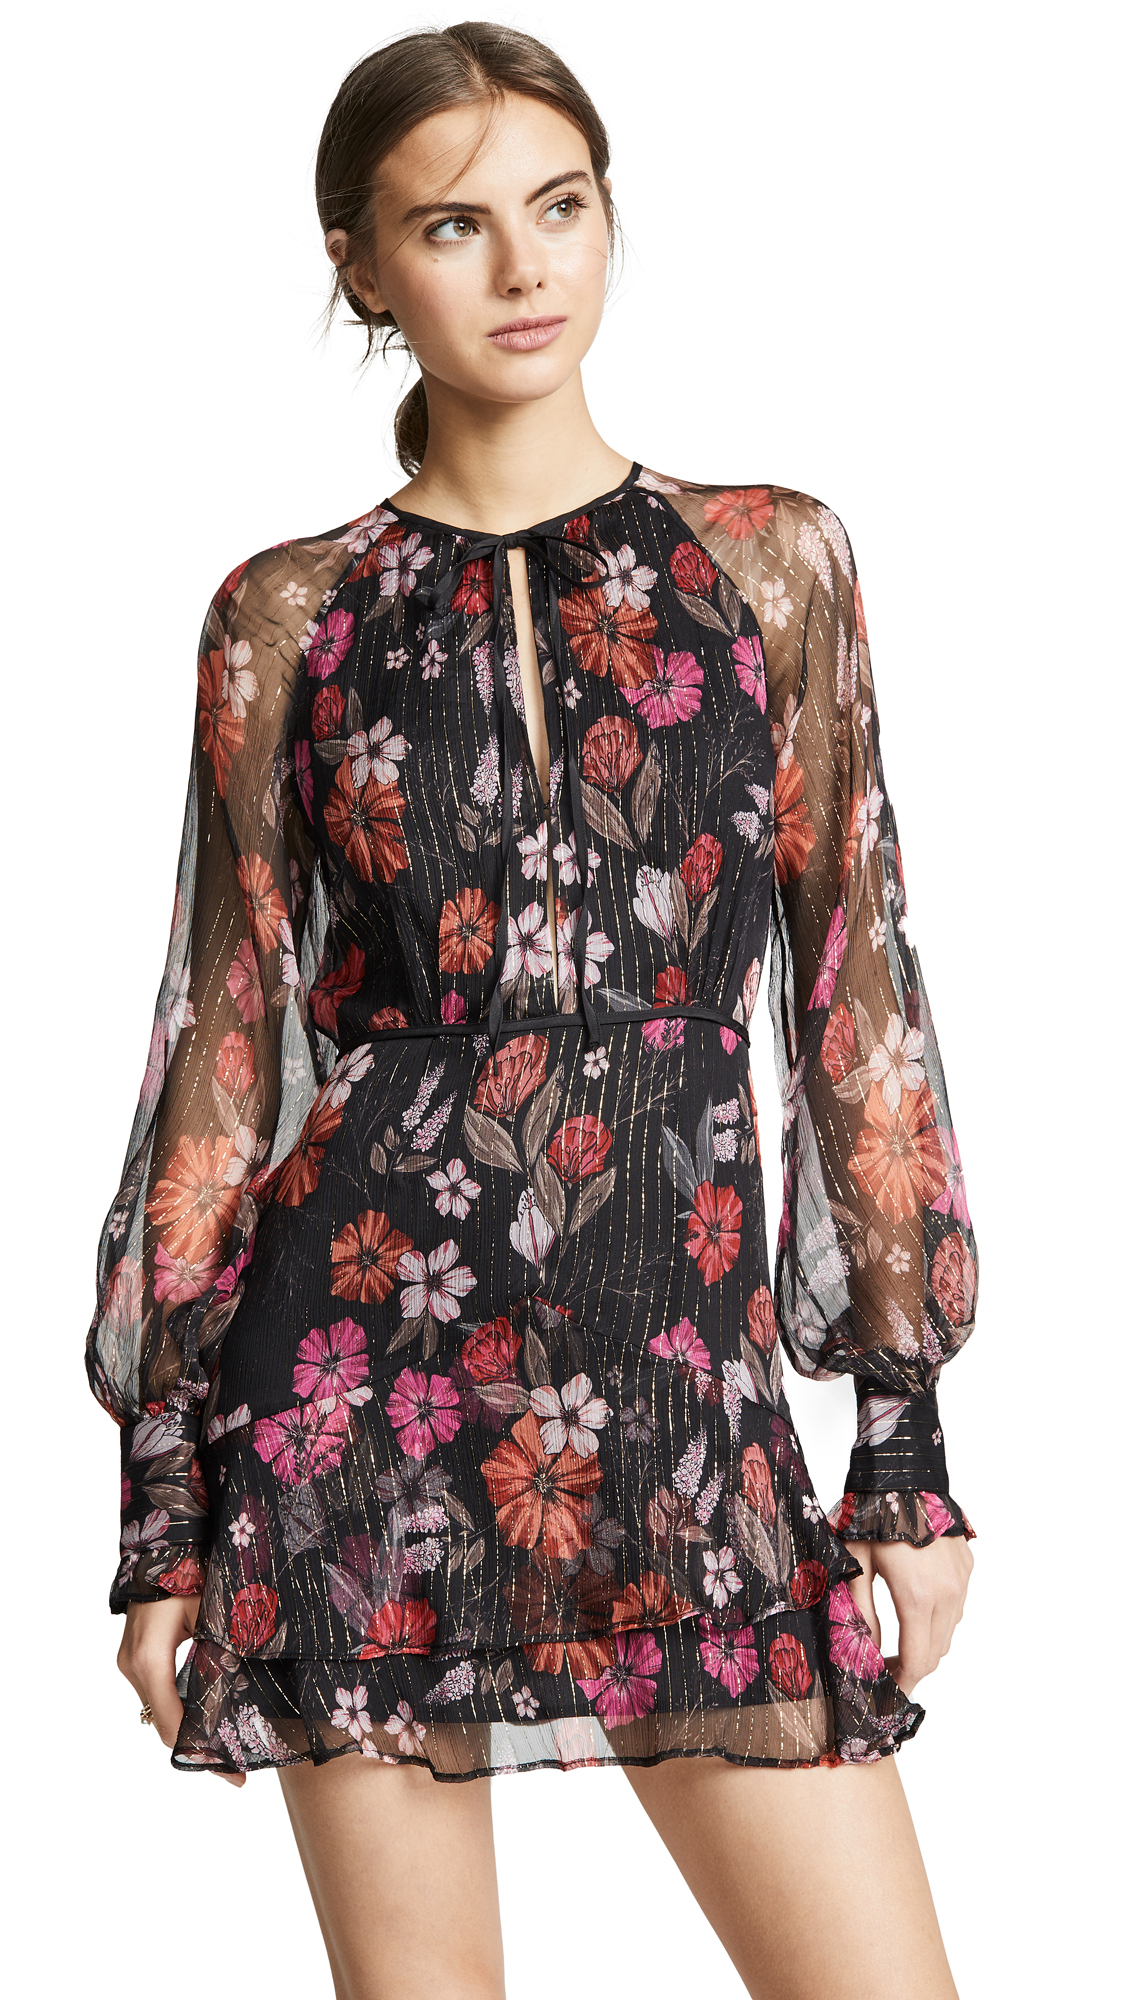 La Maison Talulah Wild Bloom Long Sleeve Mini Dress - Winter Floral Print